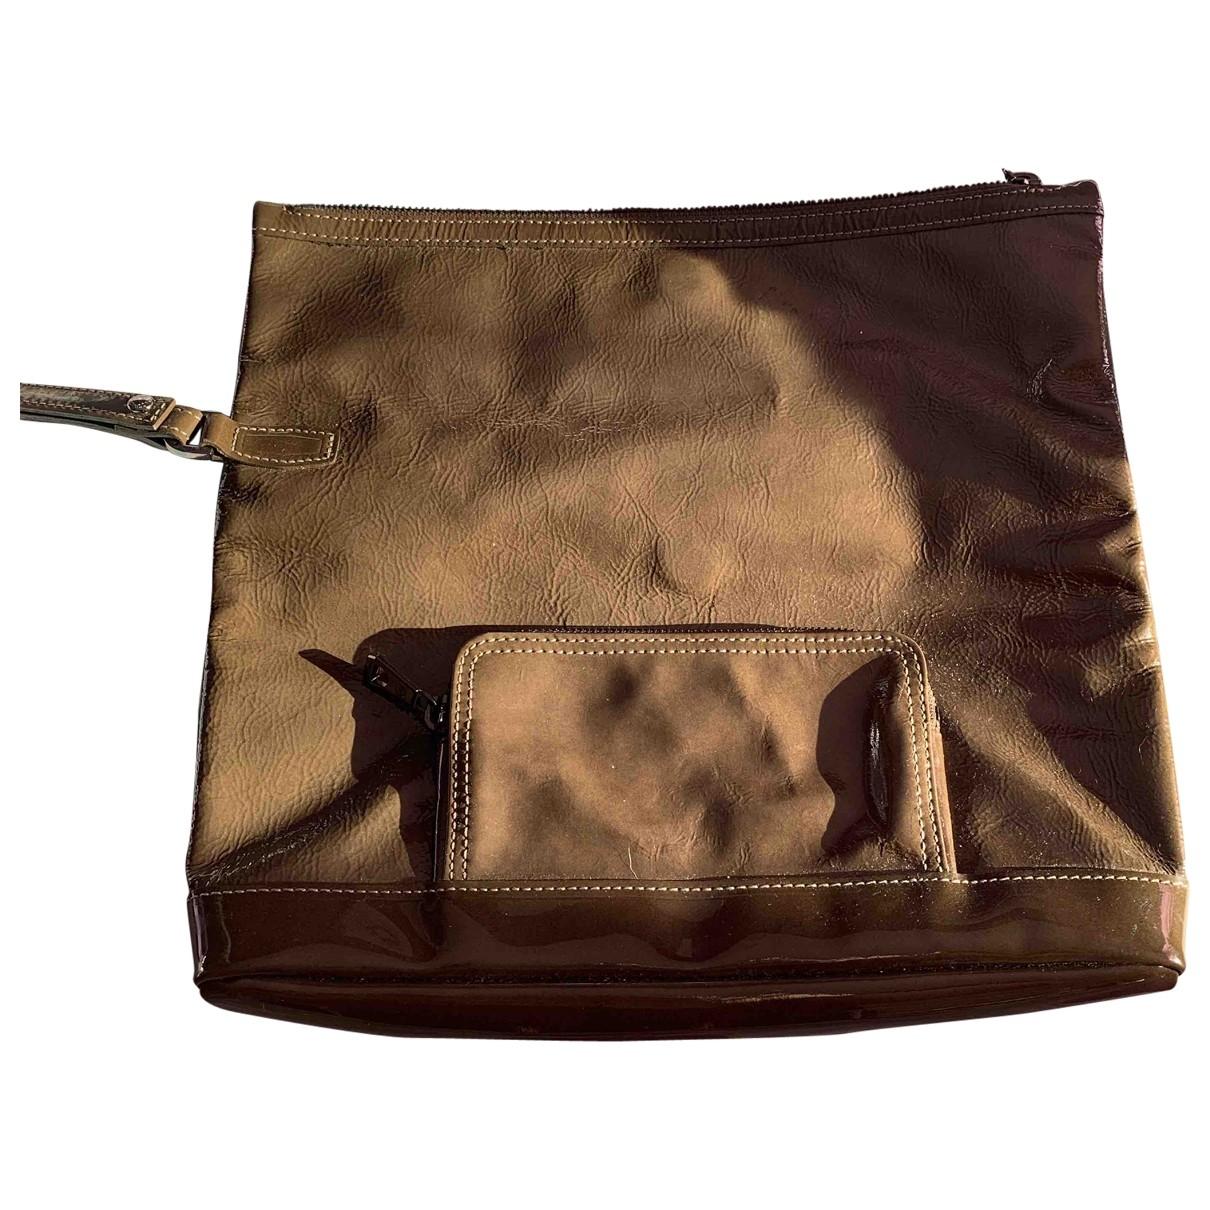 Longchamp \N Khaki Patent leather Clutch bag for Women \N